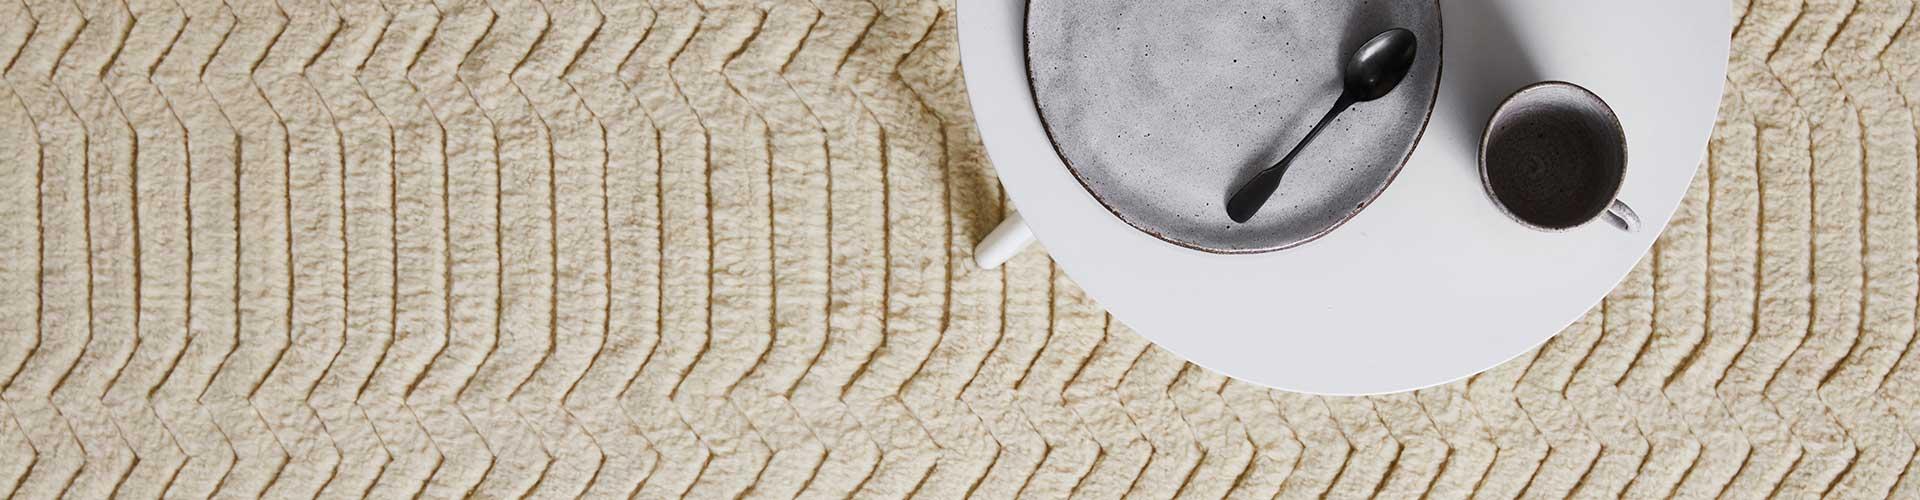 RM Living Cincinnati Interior Design Contemporary Rugs and Floor Coverings by Armadillo Armadillo8